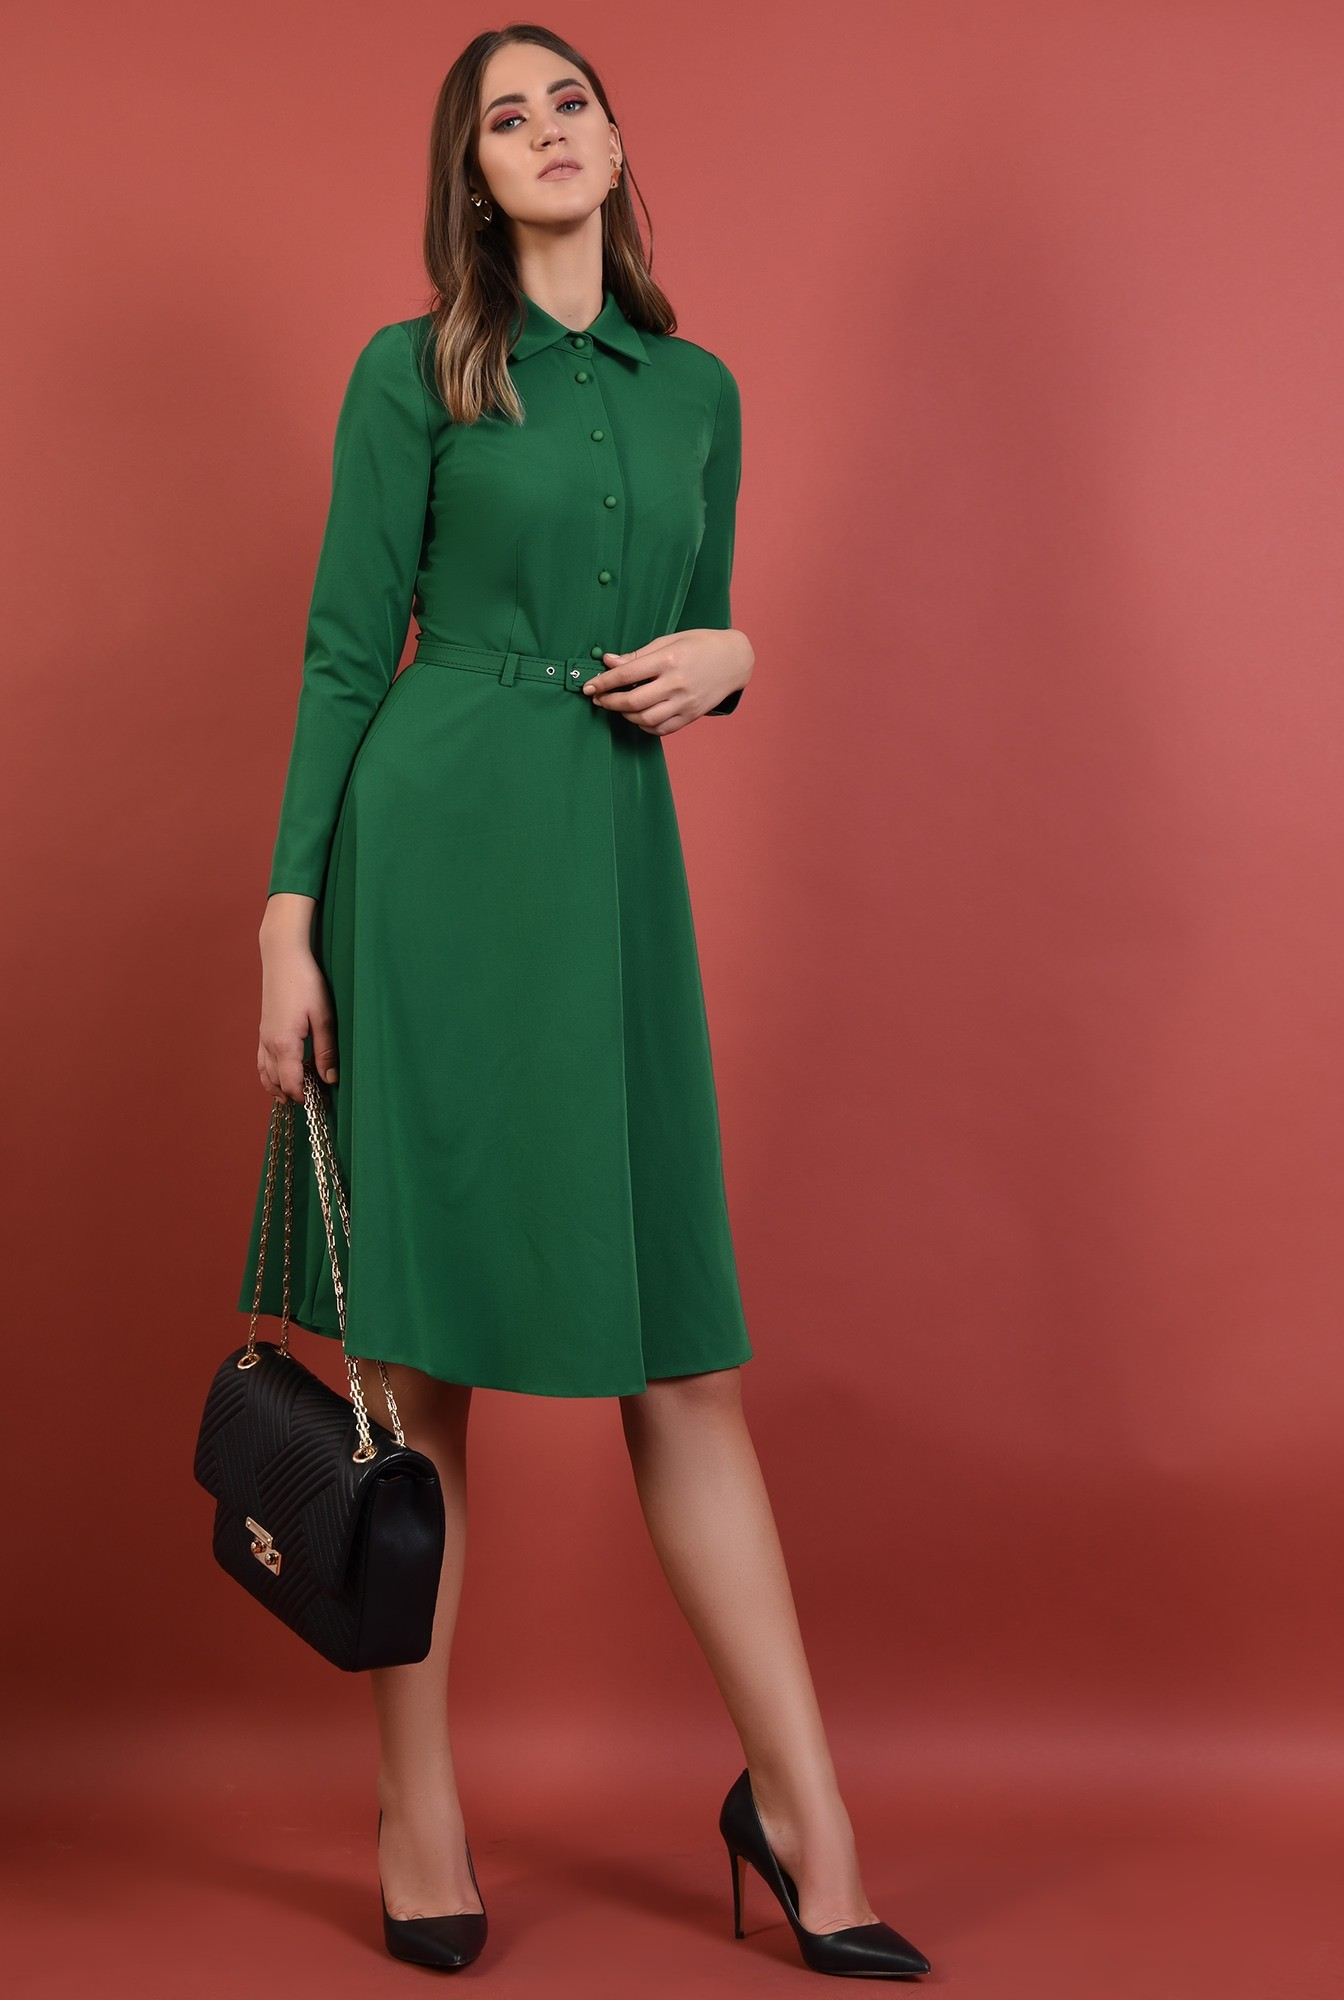 360 - rochie verde, office, midi, croi evazat, maneci lungi, curea, Poema